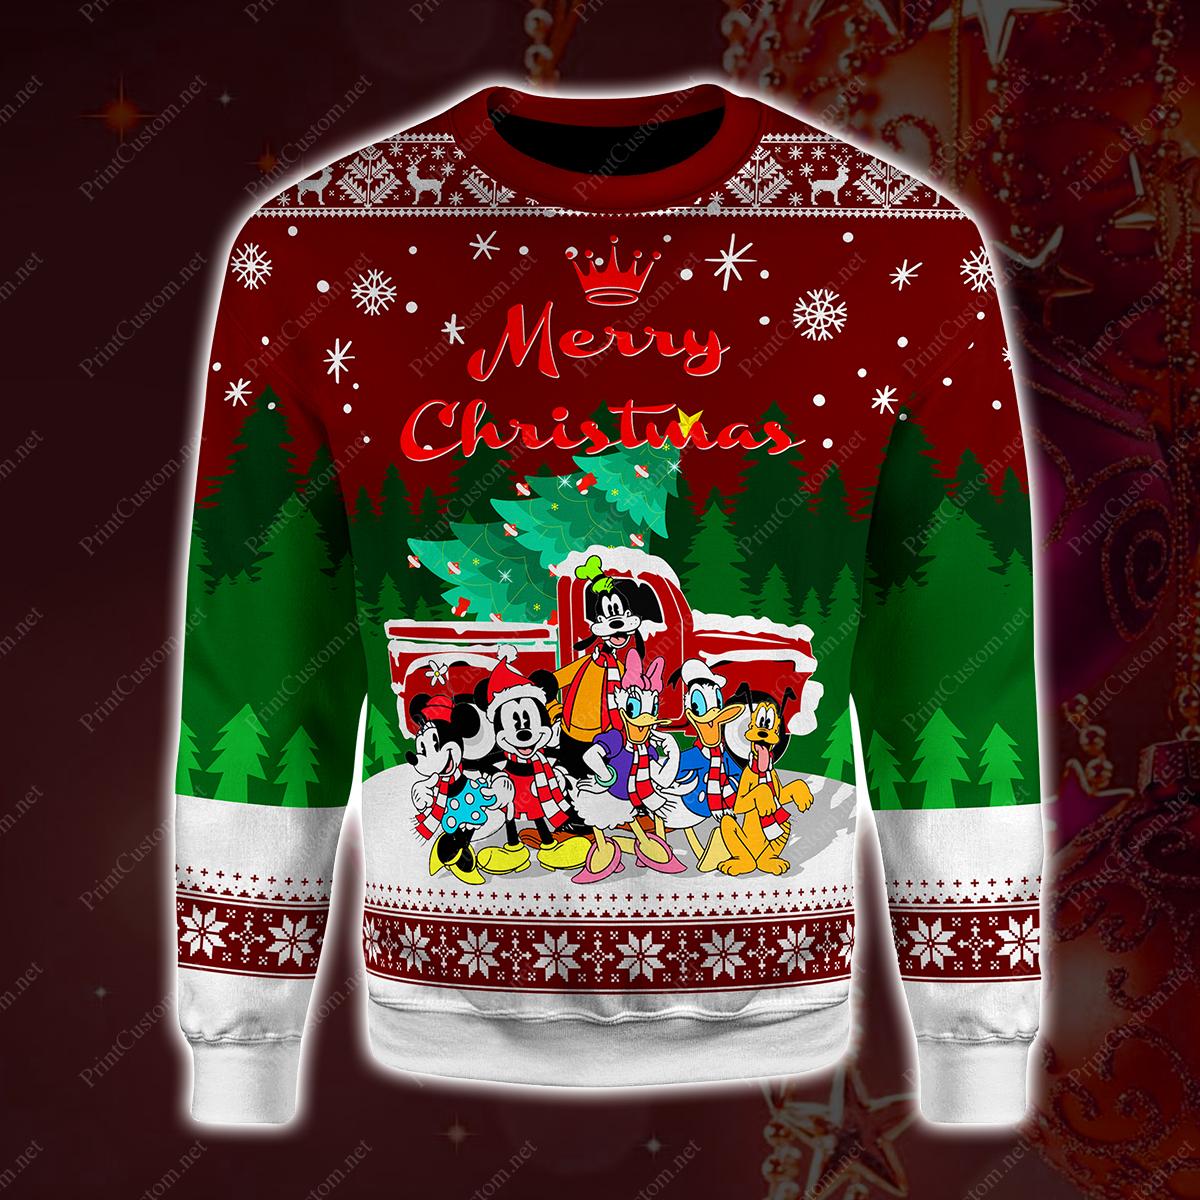 Disney characters merry christmas full printing shirt 1